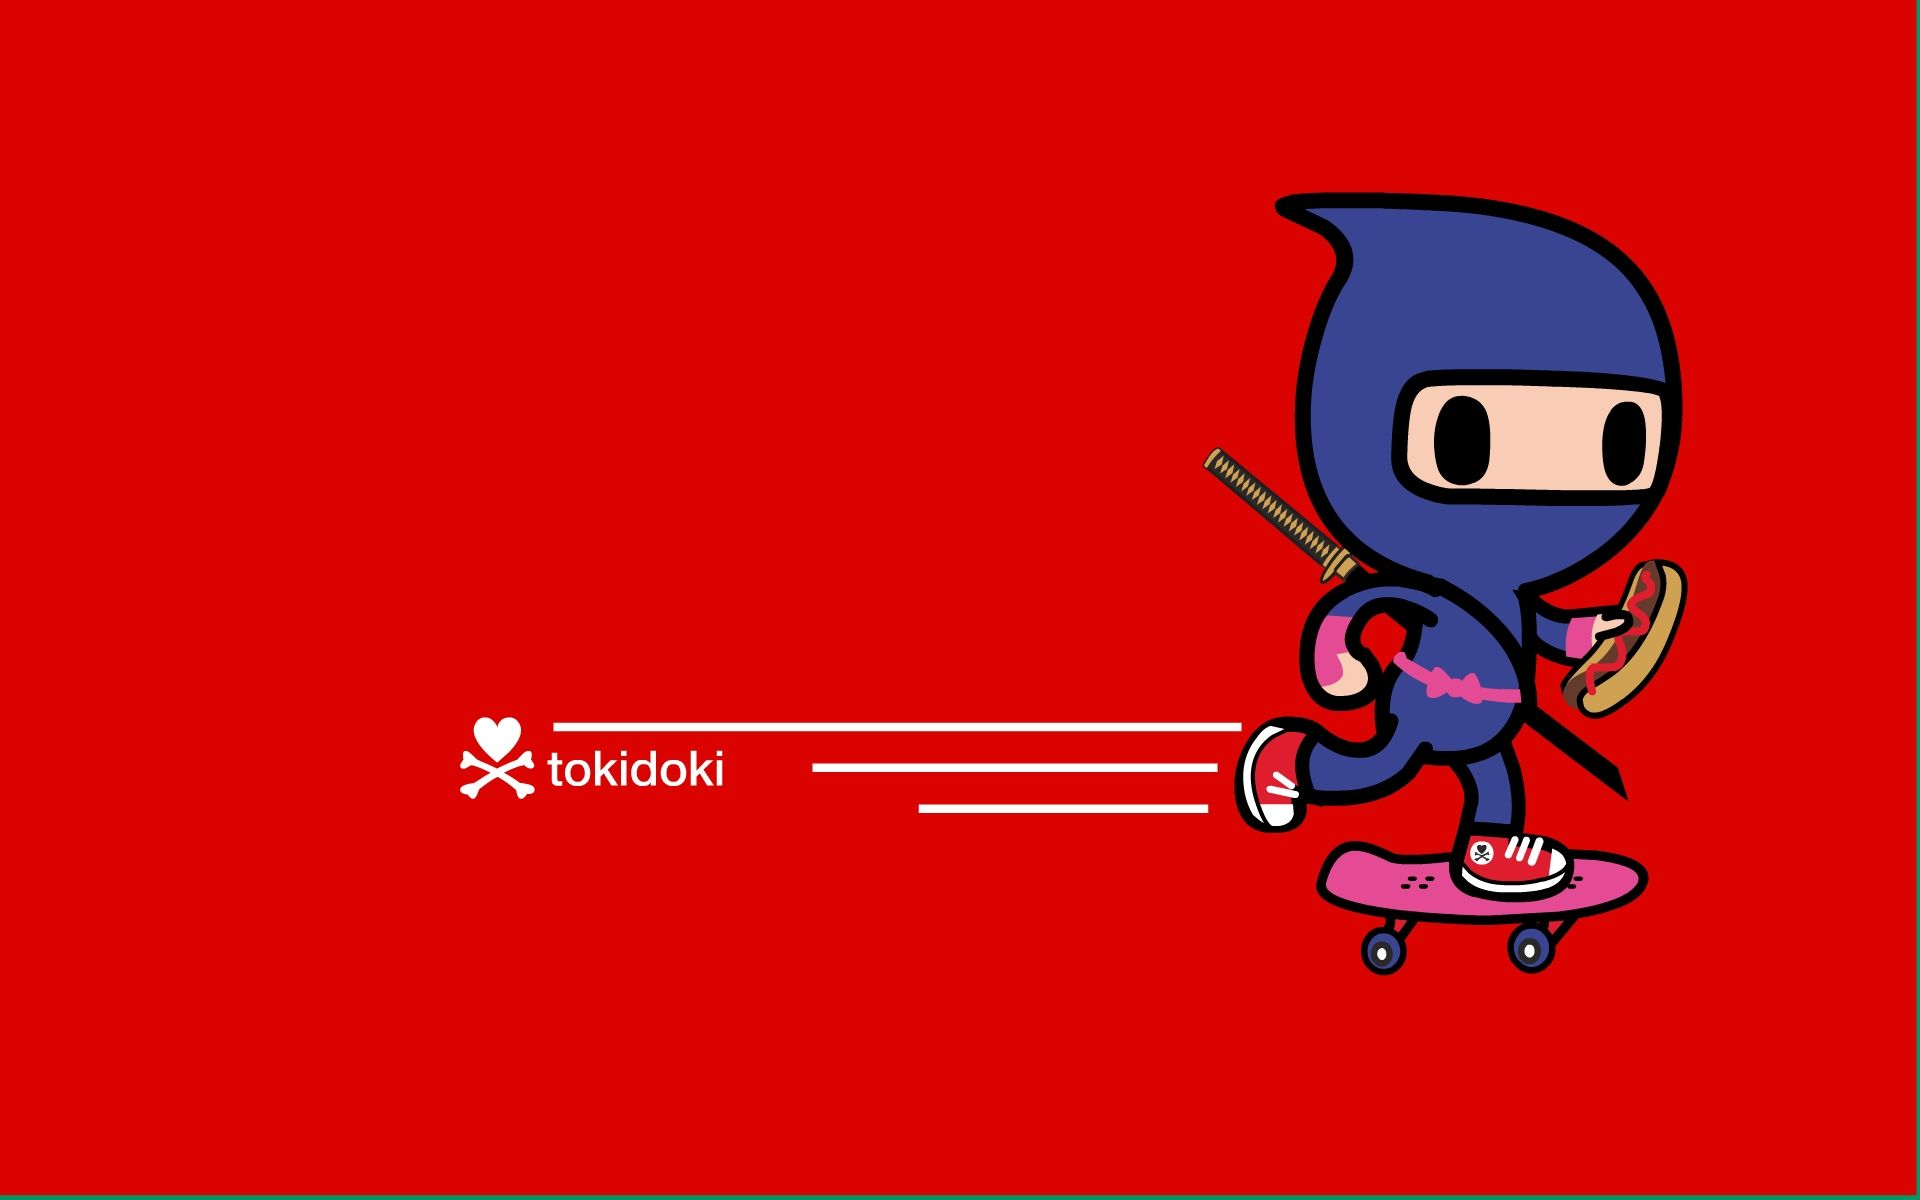 Toki Ninja Tokidoki Hd Wallpaper Full Hd Wallpaper